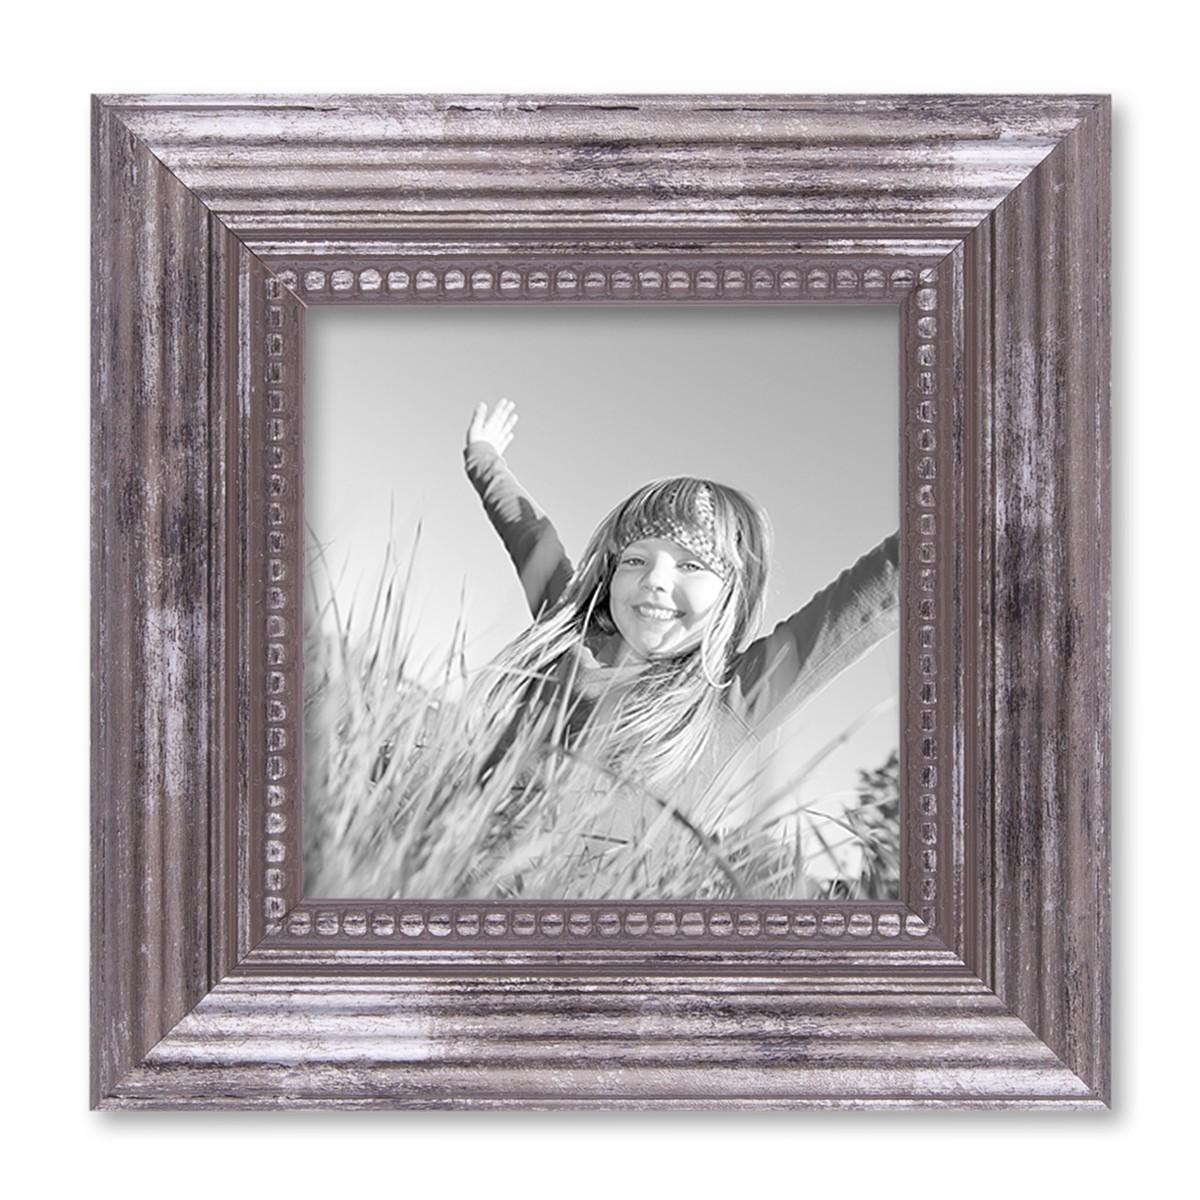 Großzügig Triple Silber Fotorahmen Fotos - Benutzerdefinierte ...